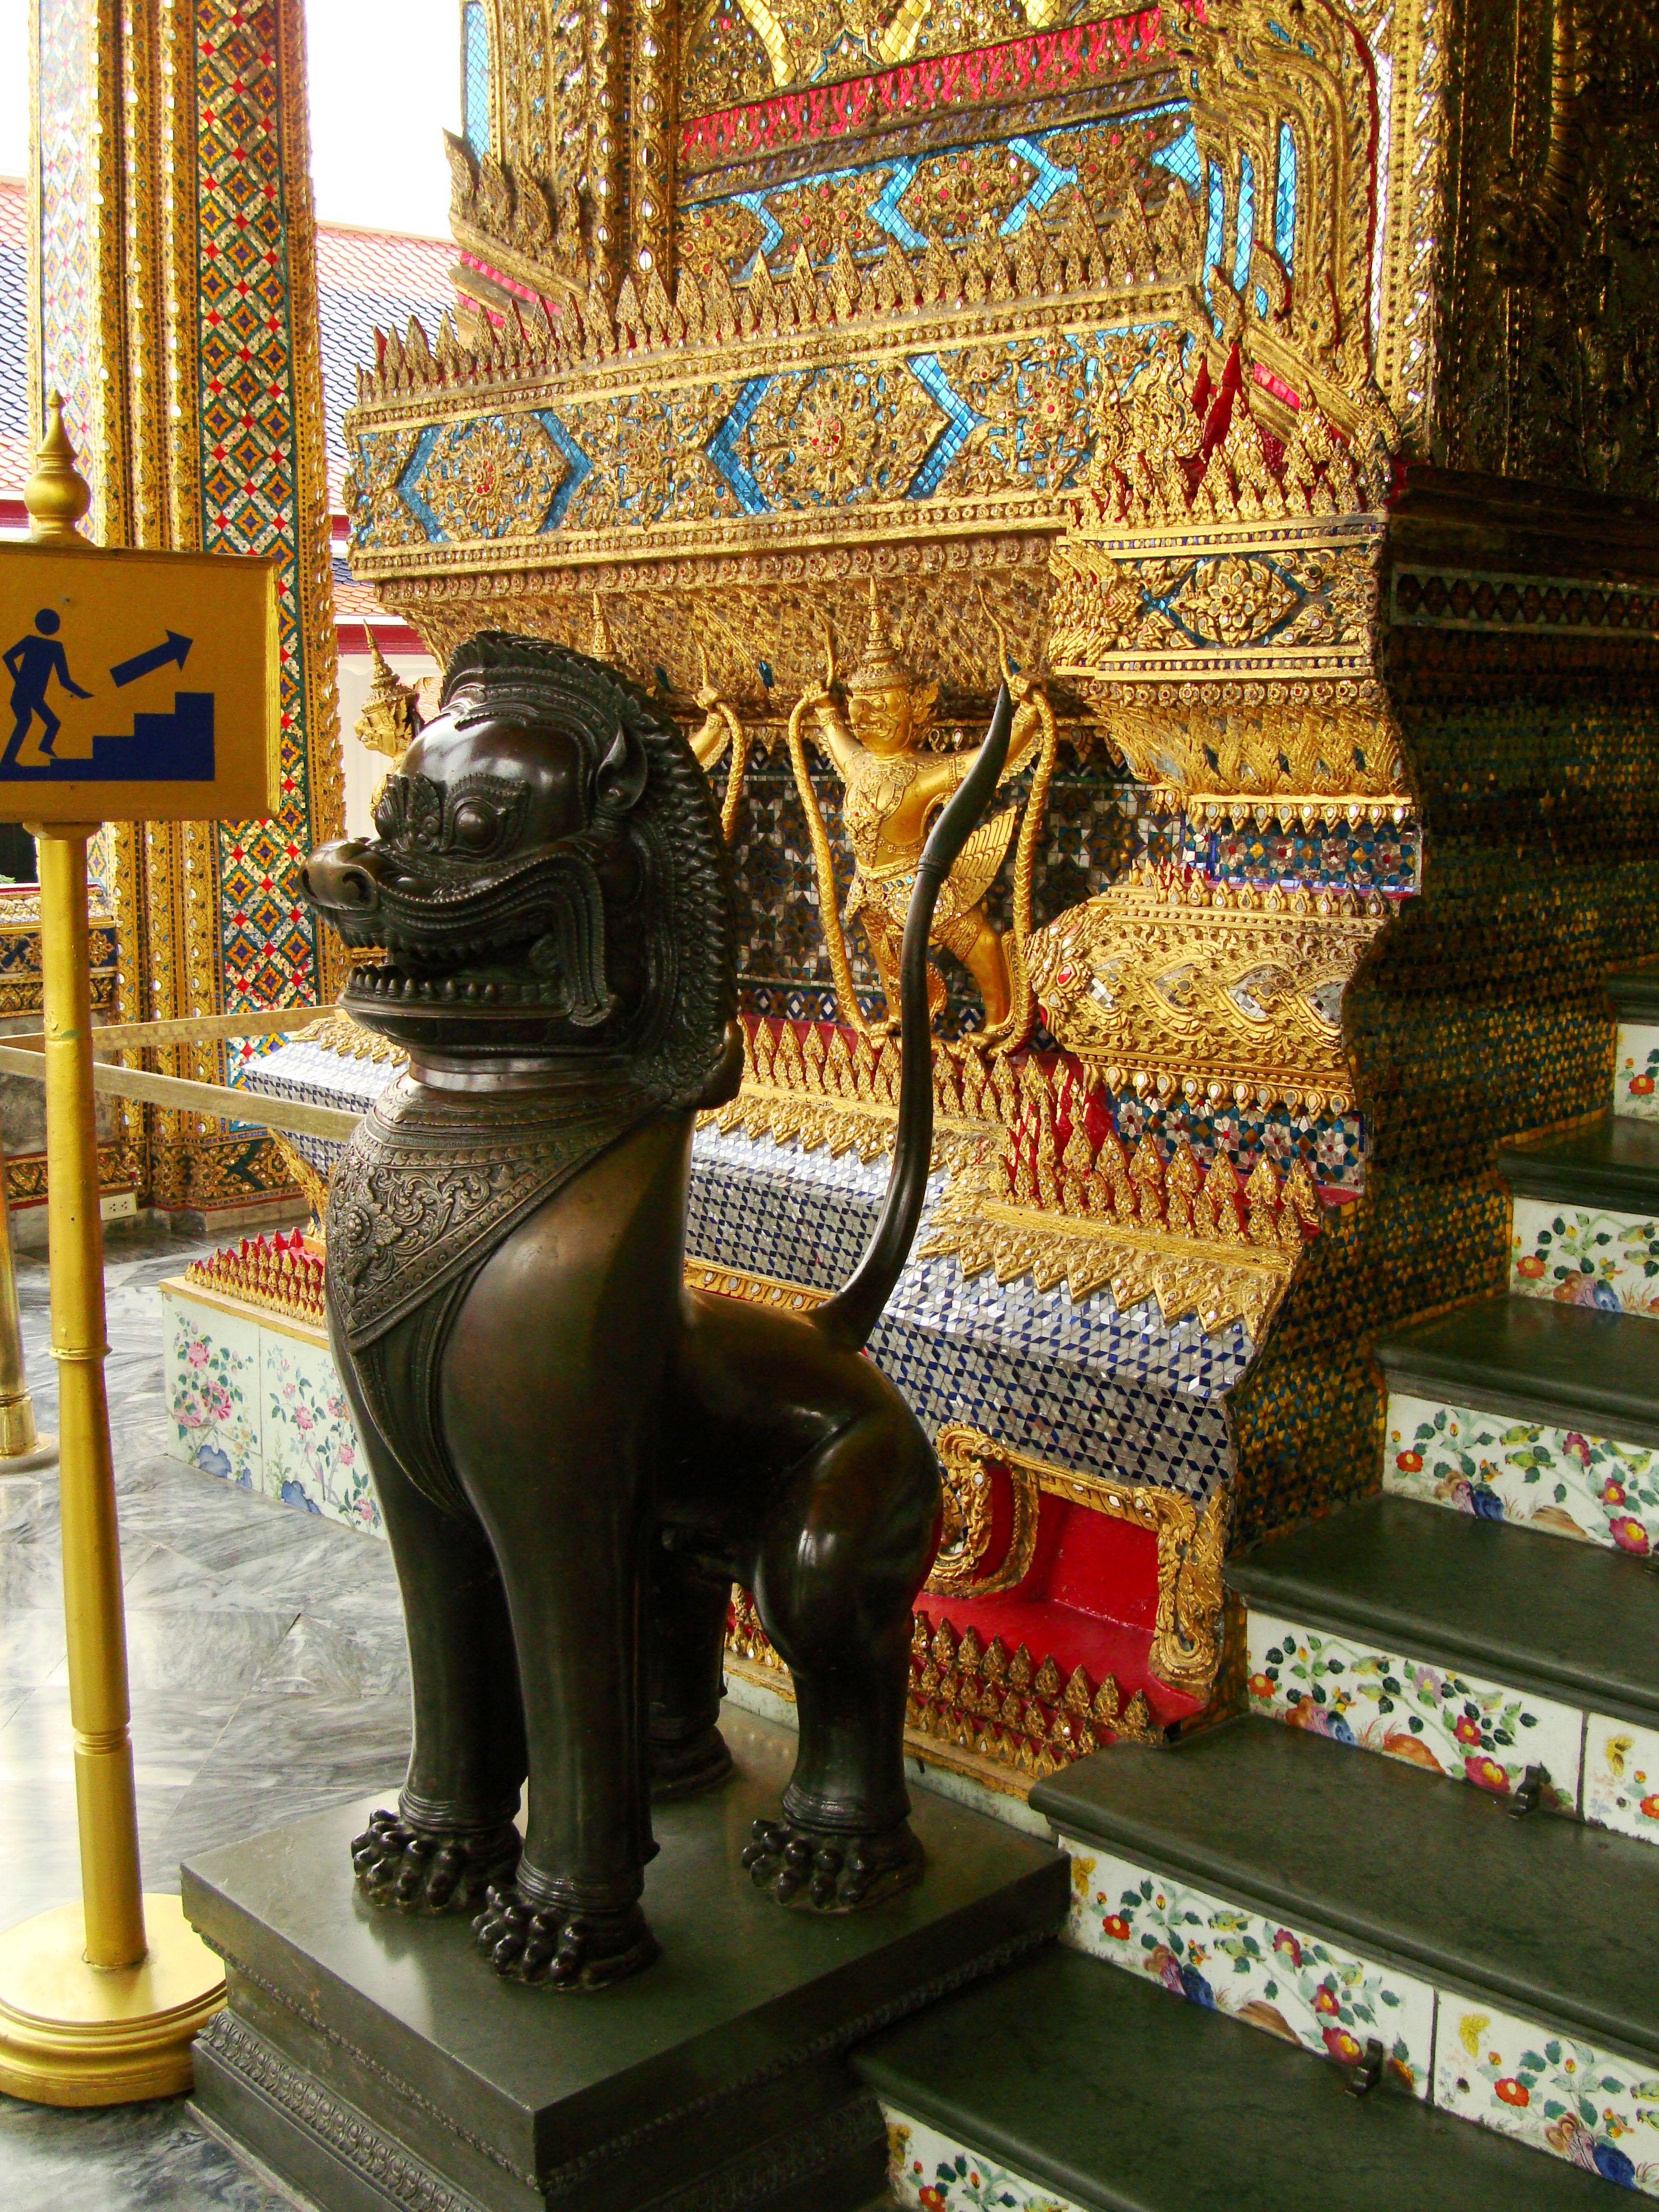 War bounty Cambodian Bronze Lion guardian statue Bangkok Thailand 02